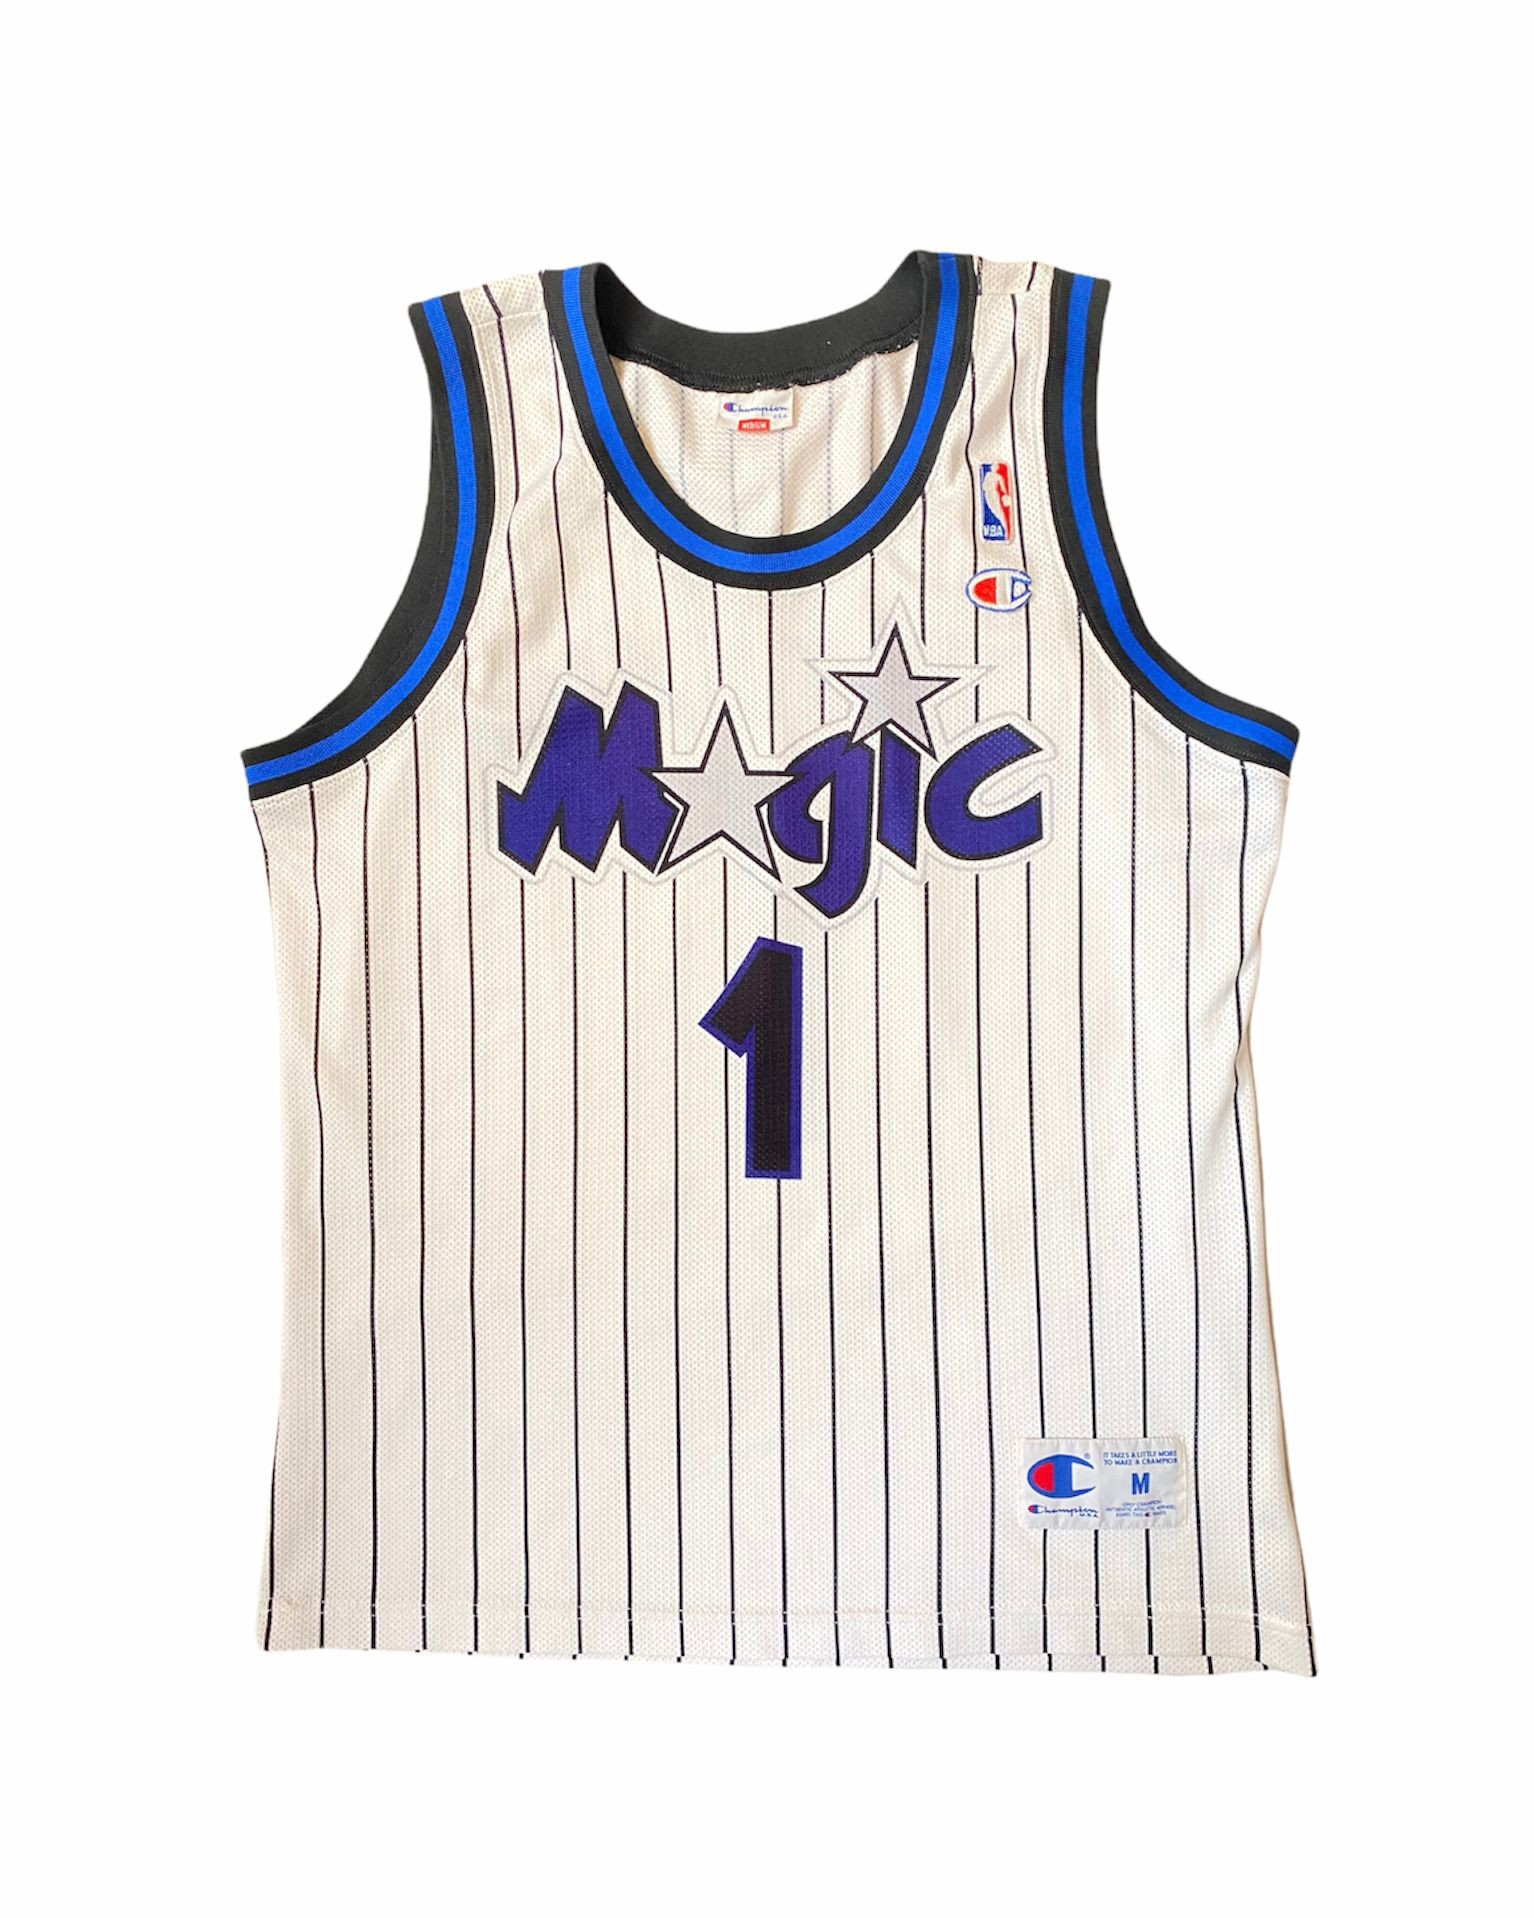 Champion 90's Orlando Magic Hardaway Jersey (M)